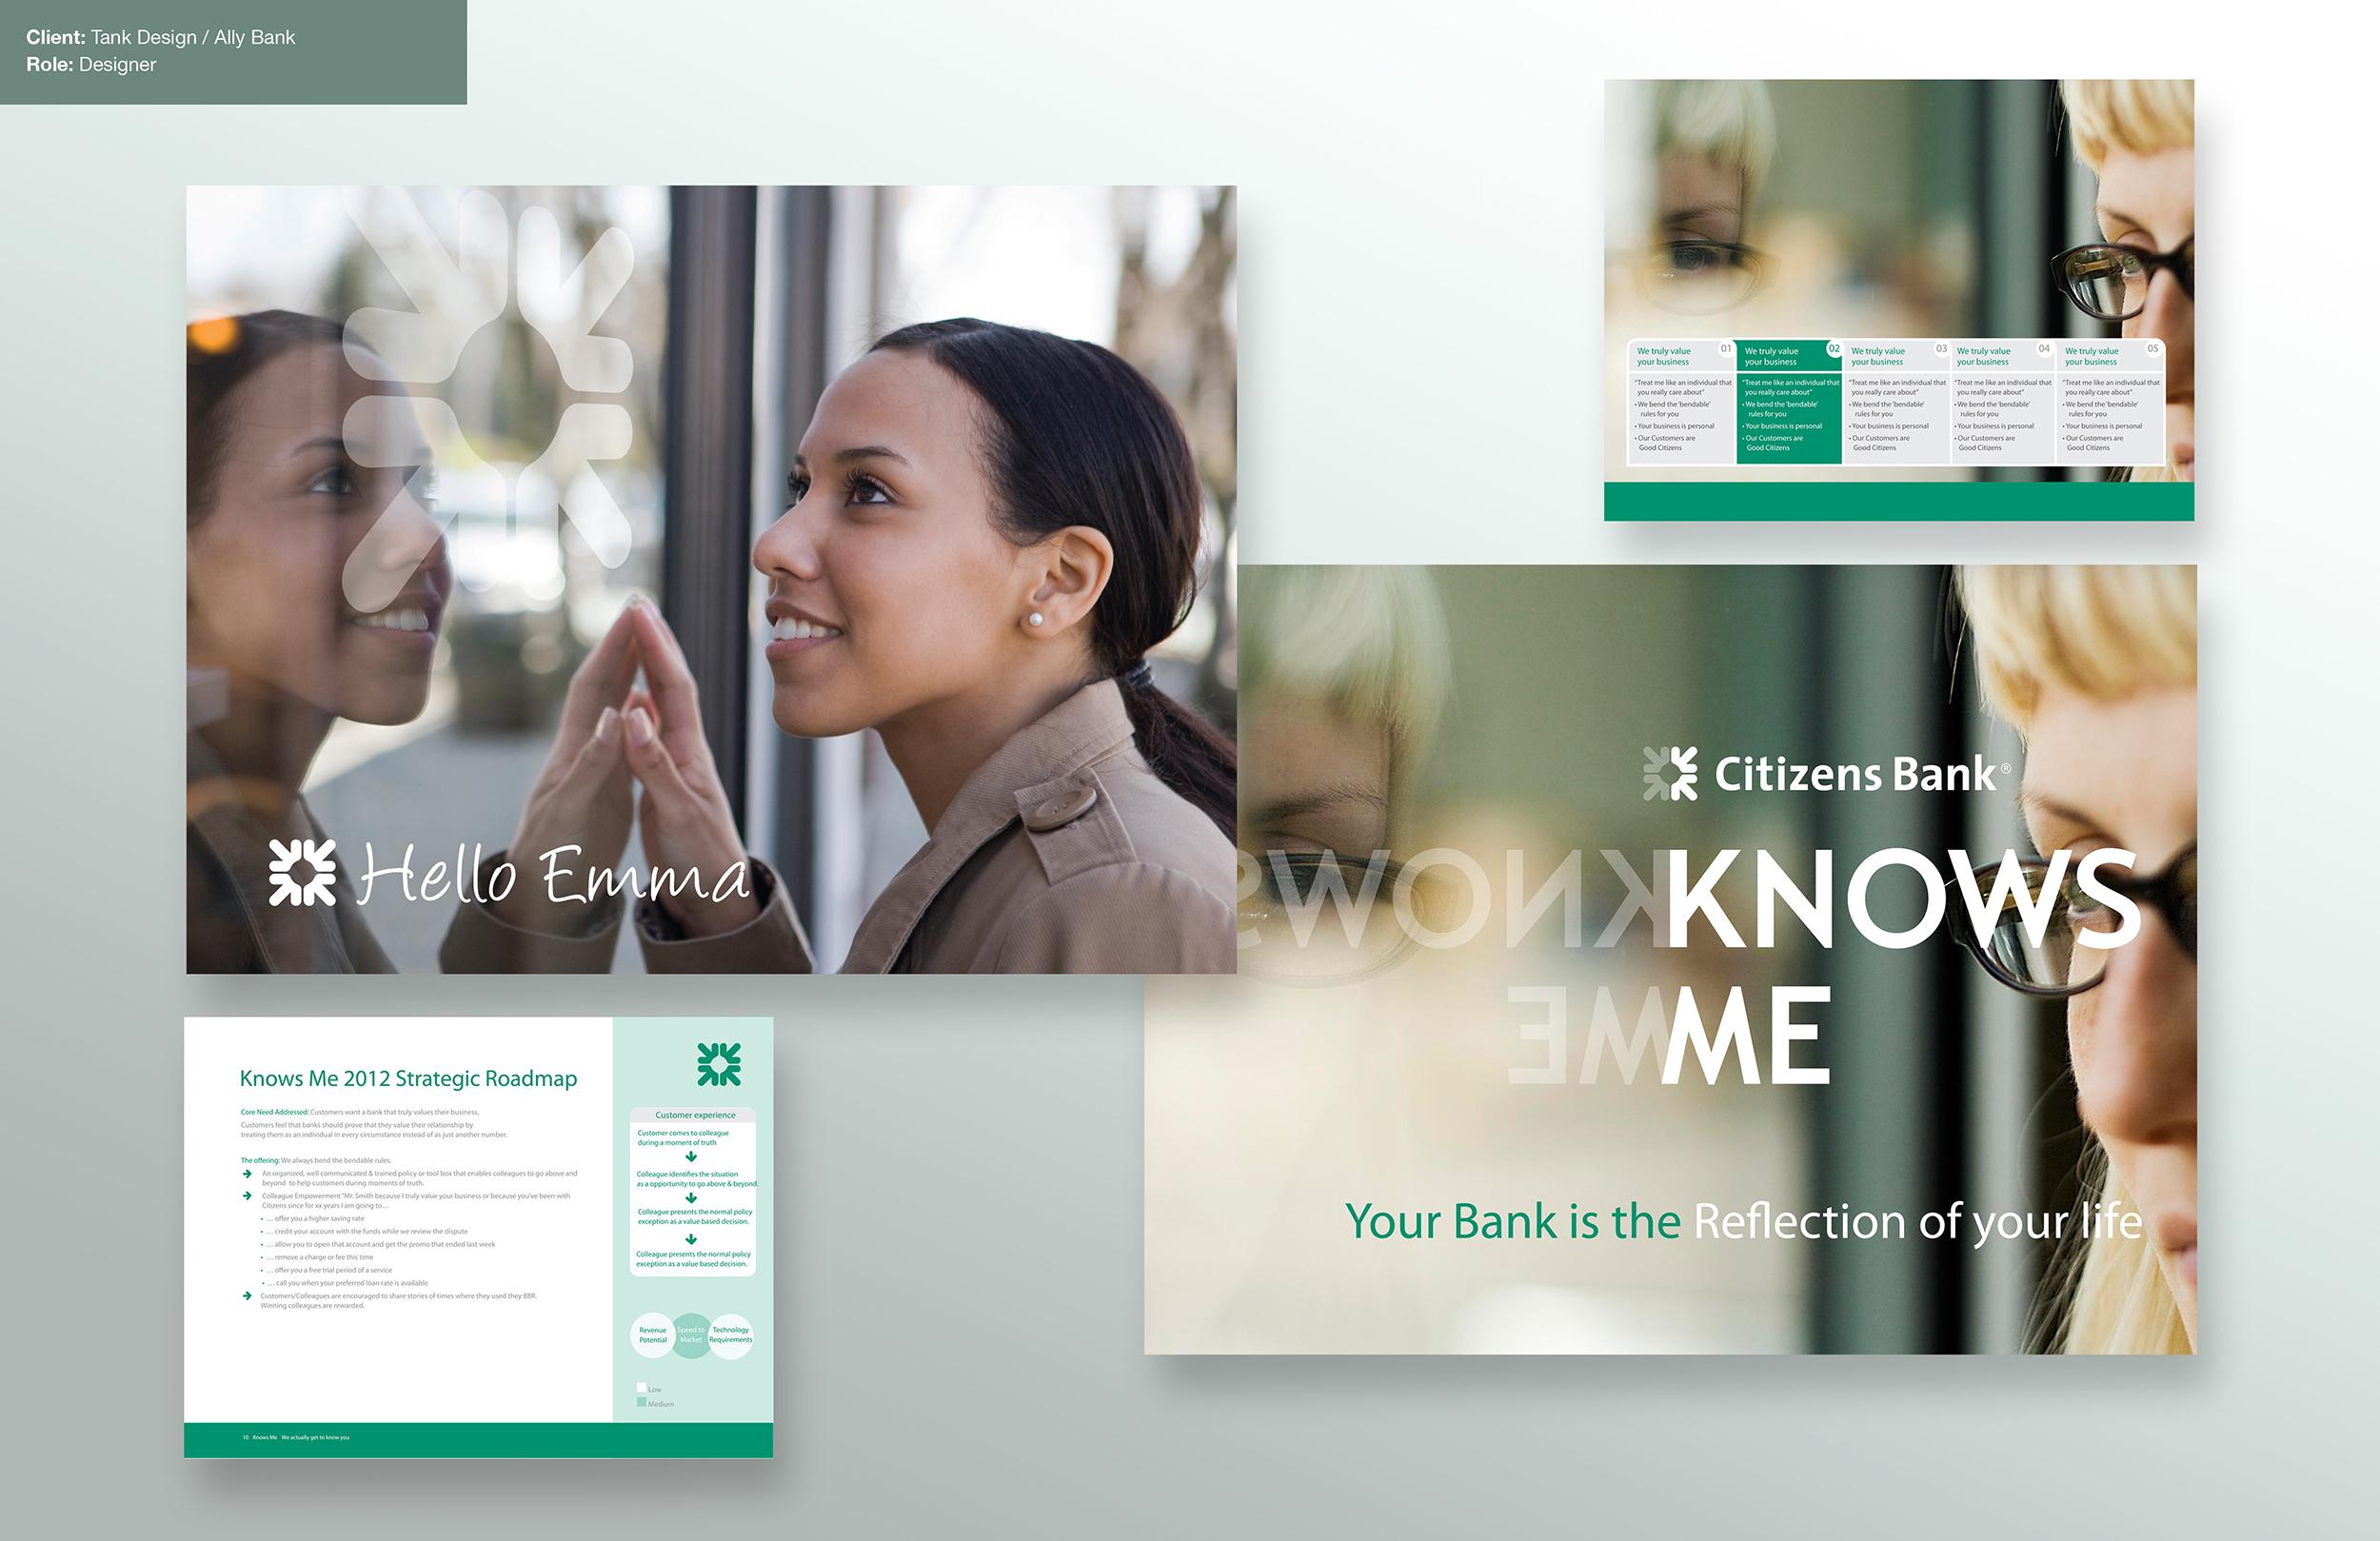 Advertising design for Citizen Bank. Tank Design.